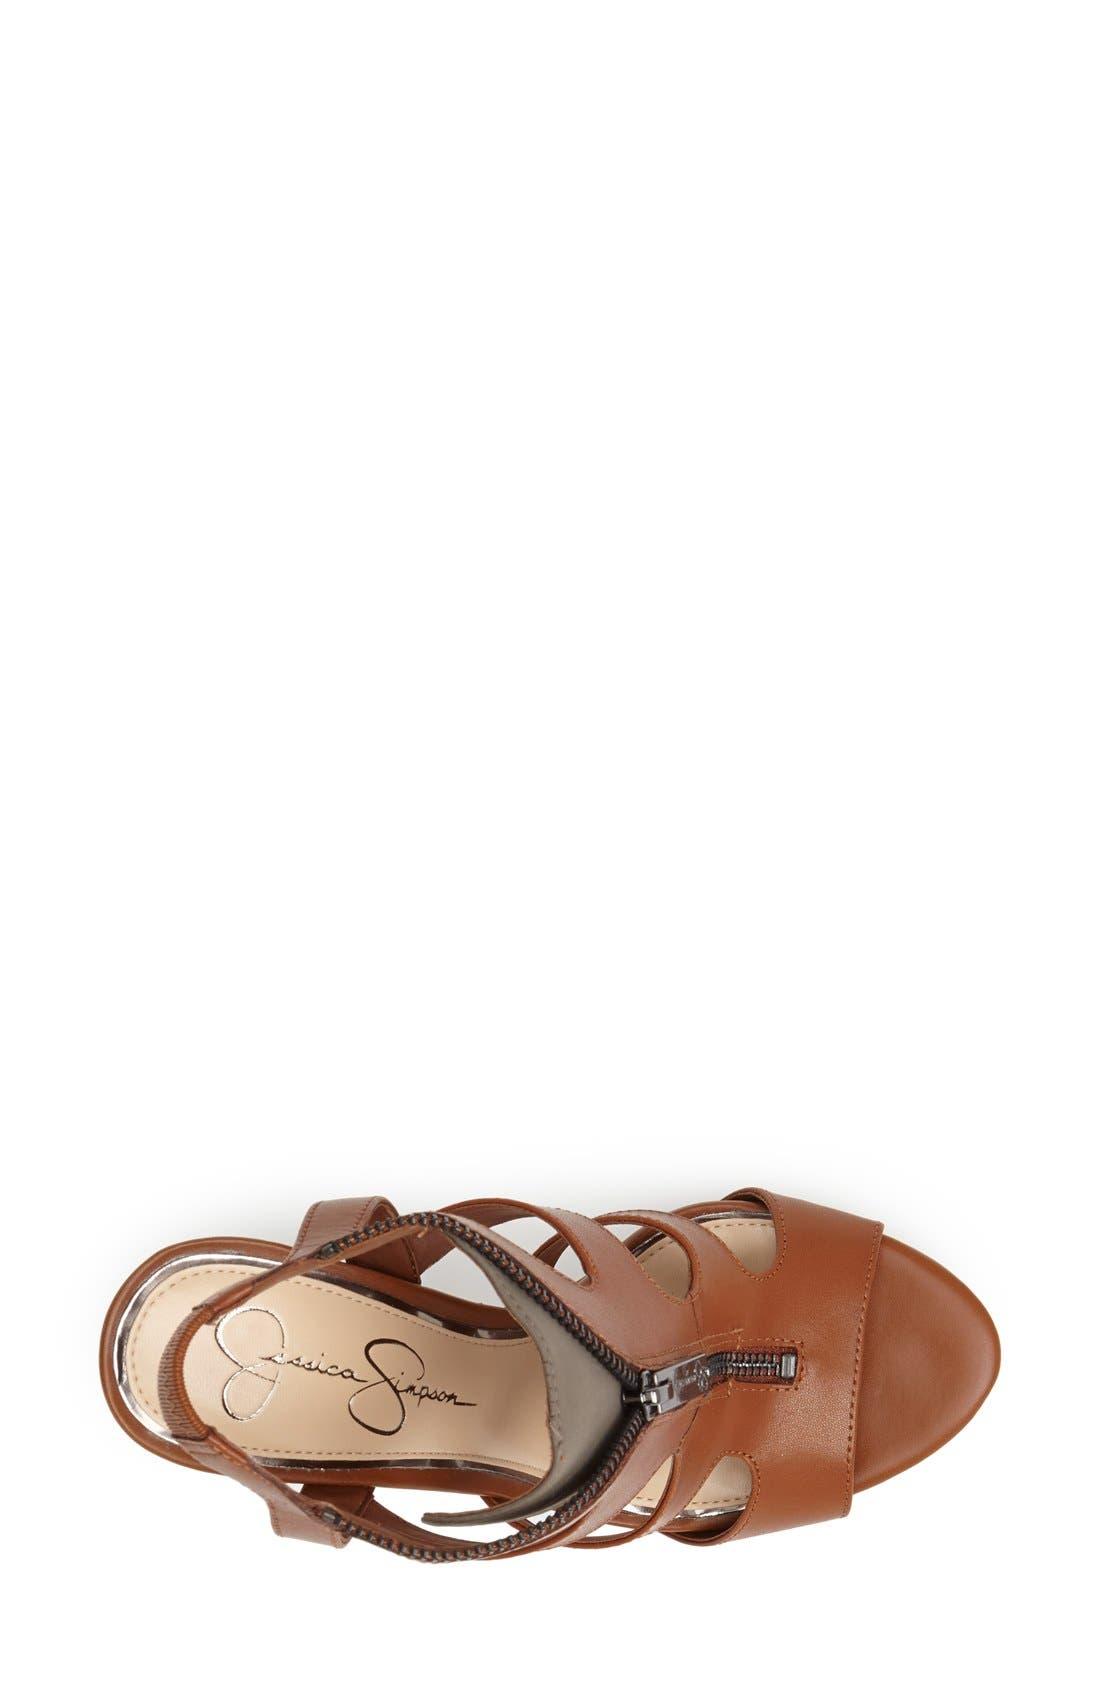 Alternate Image 3  - Jessica Simpson 'Carmyne' Leather Sandal (Women)